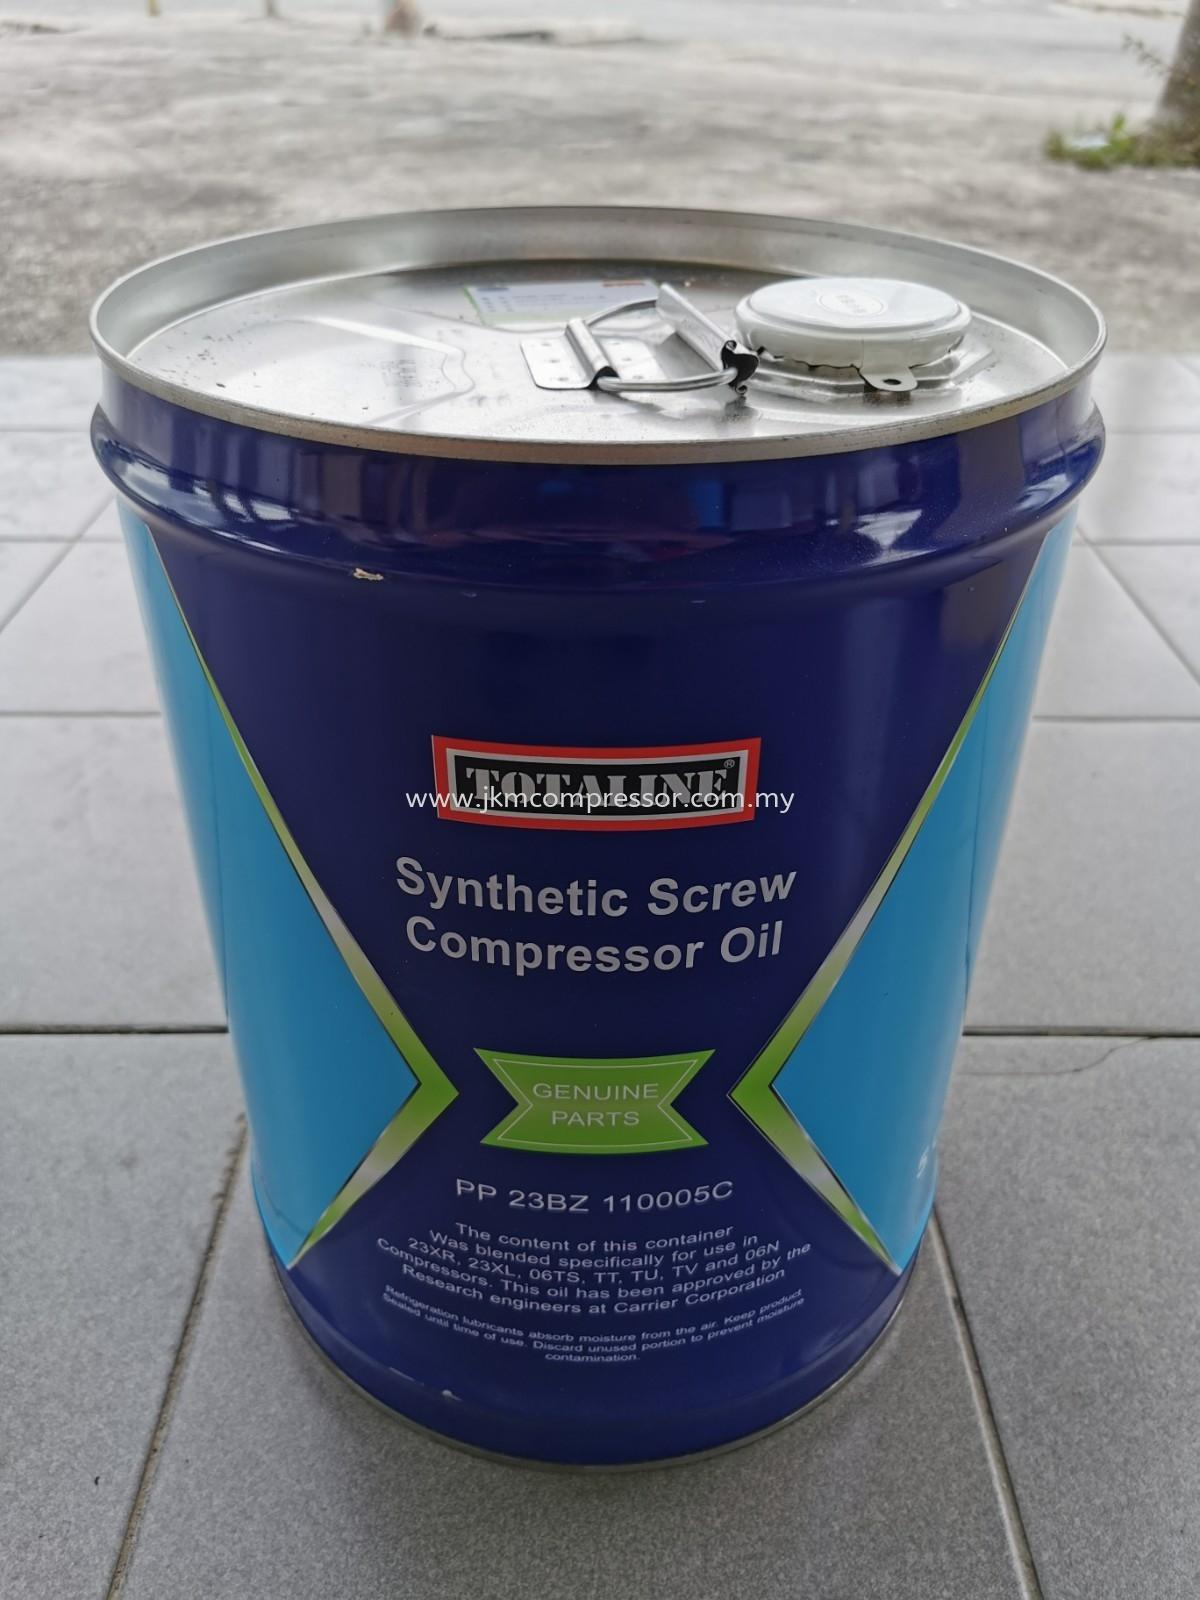 PP23BZ110005 - CARRIER PP23BZ110005C SYNTHETIC SCREW COMPRESSOR OIL